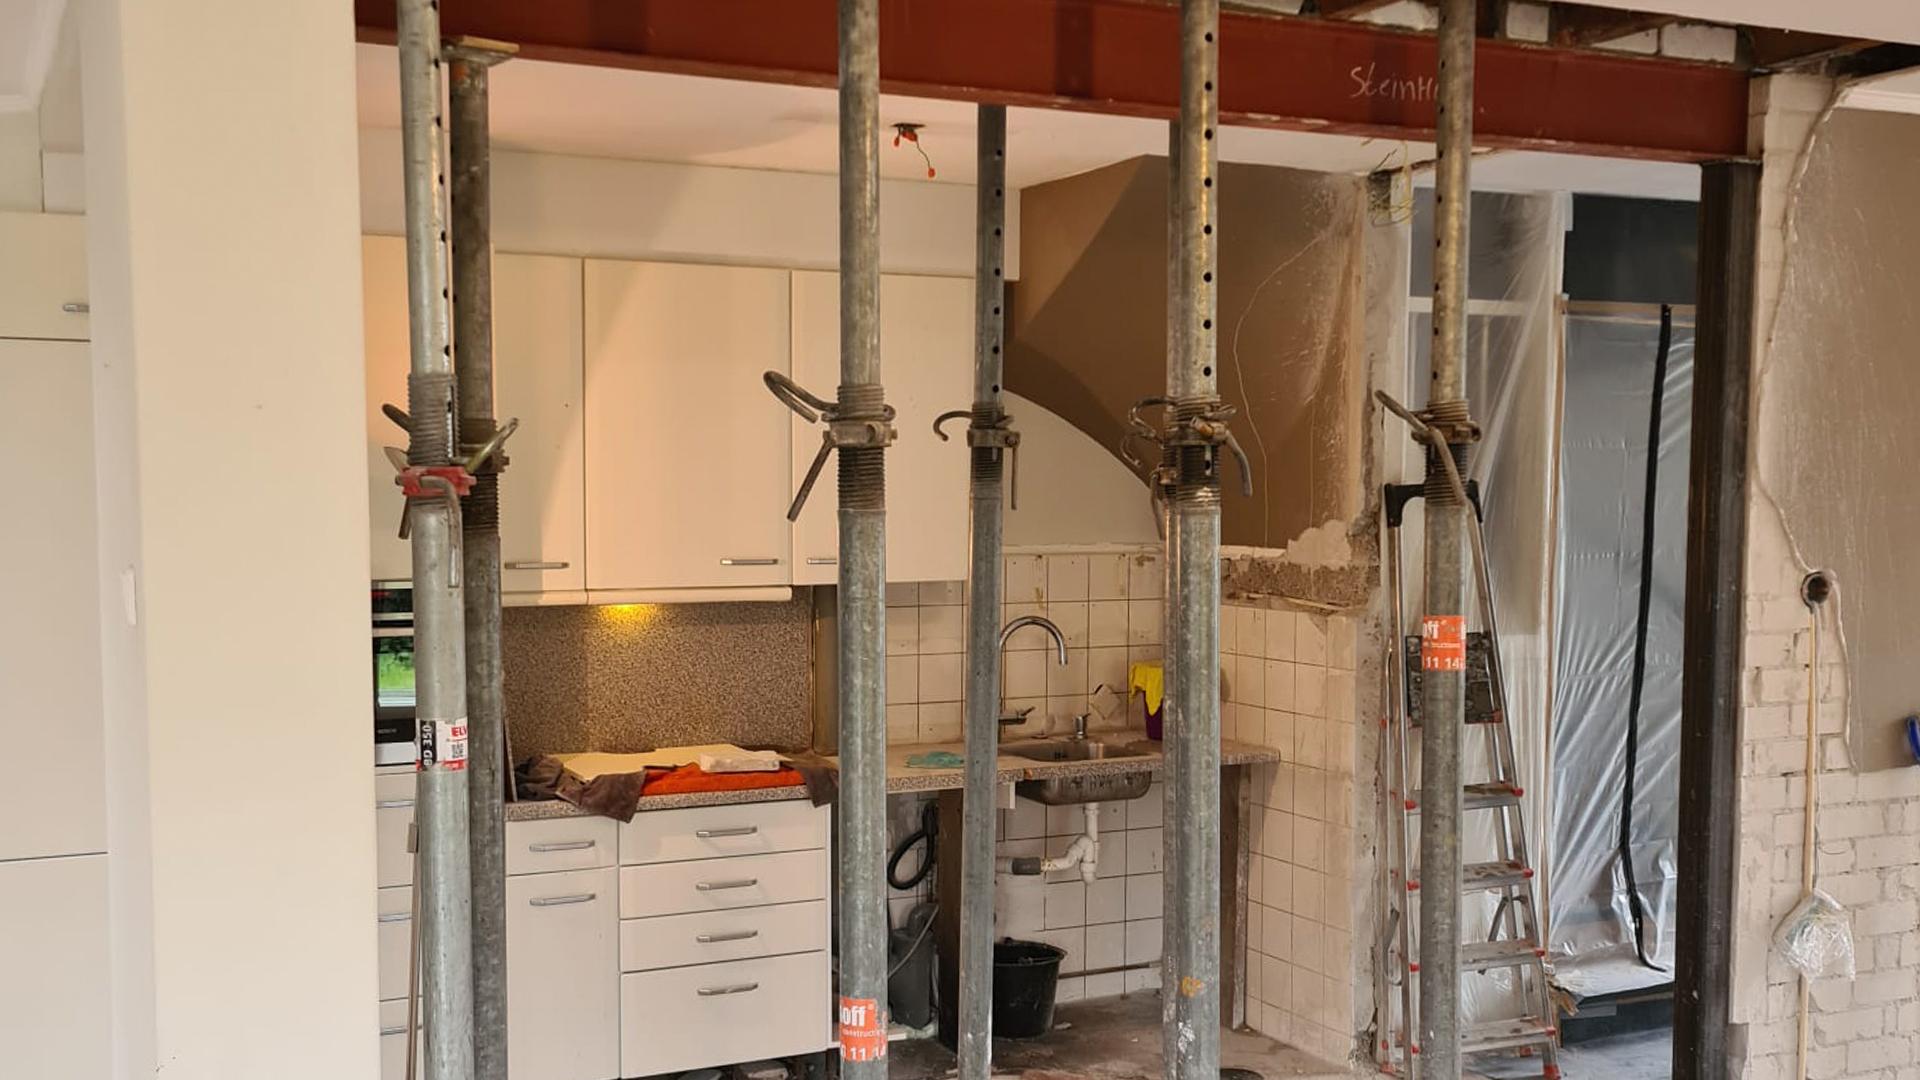 Steinhoff -  Binnenmuur verwijderen - In de praktijk